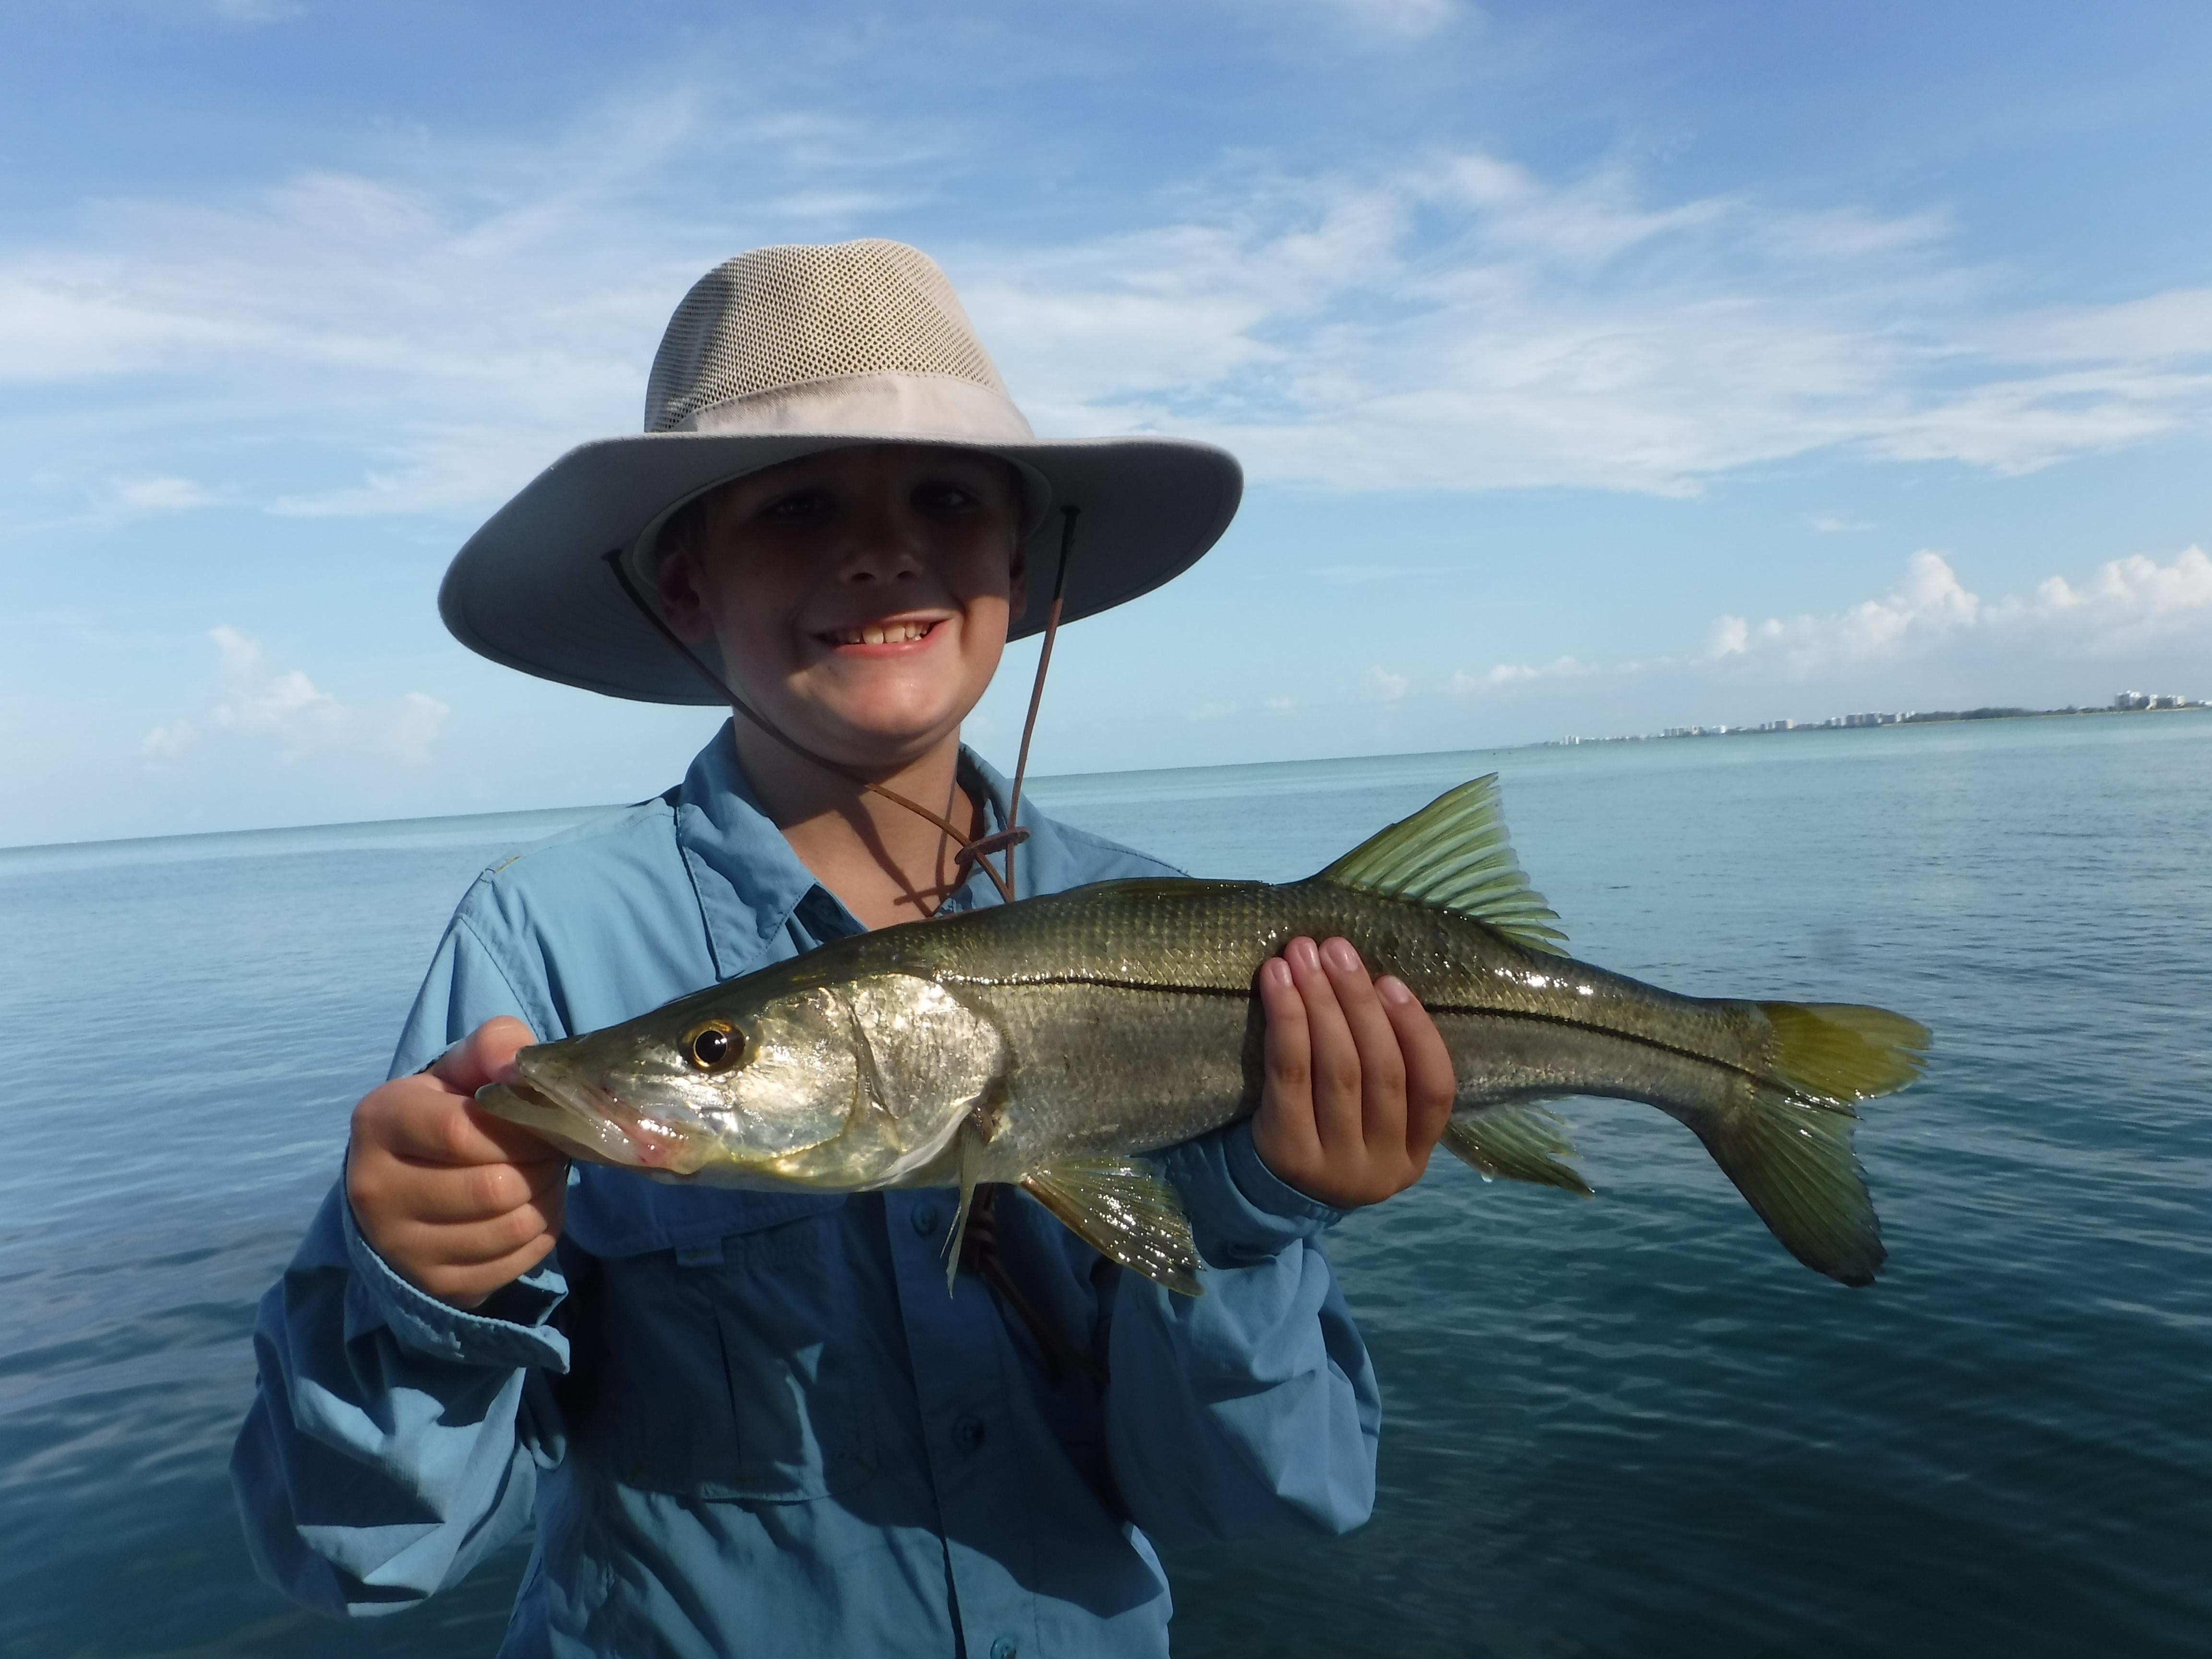 siesta key surf fishing tackle needed